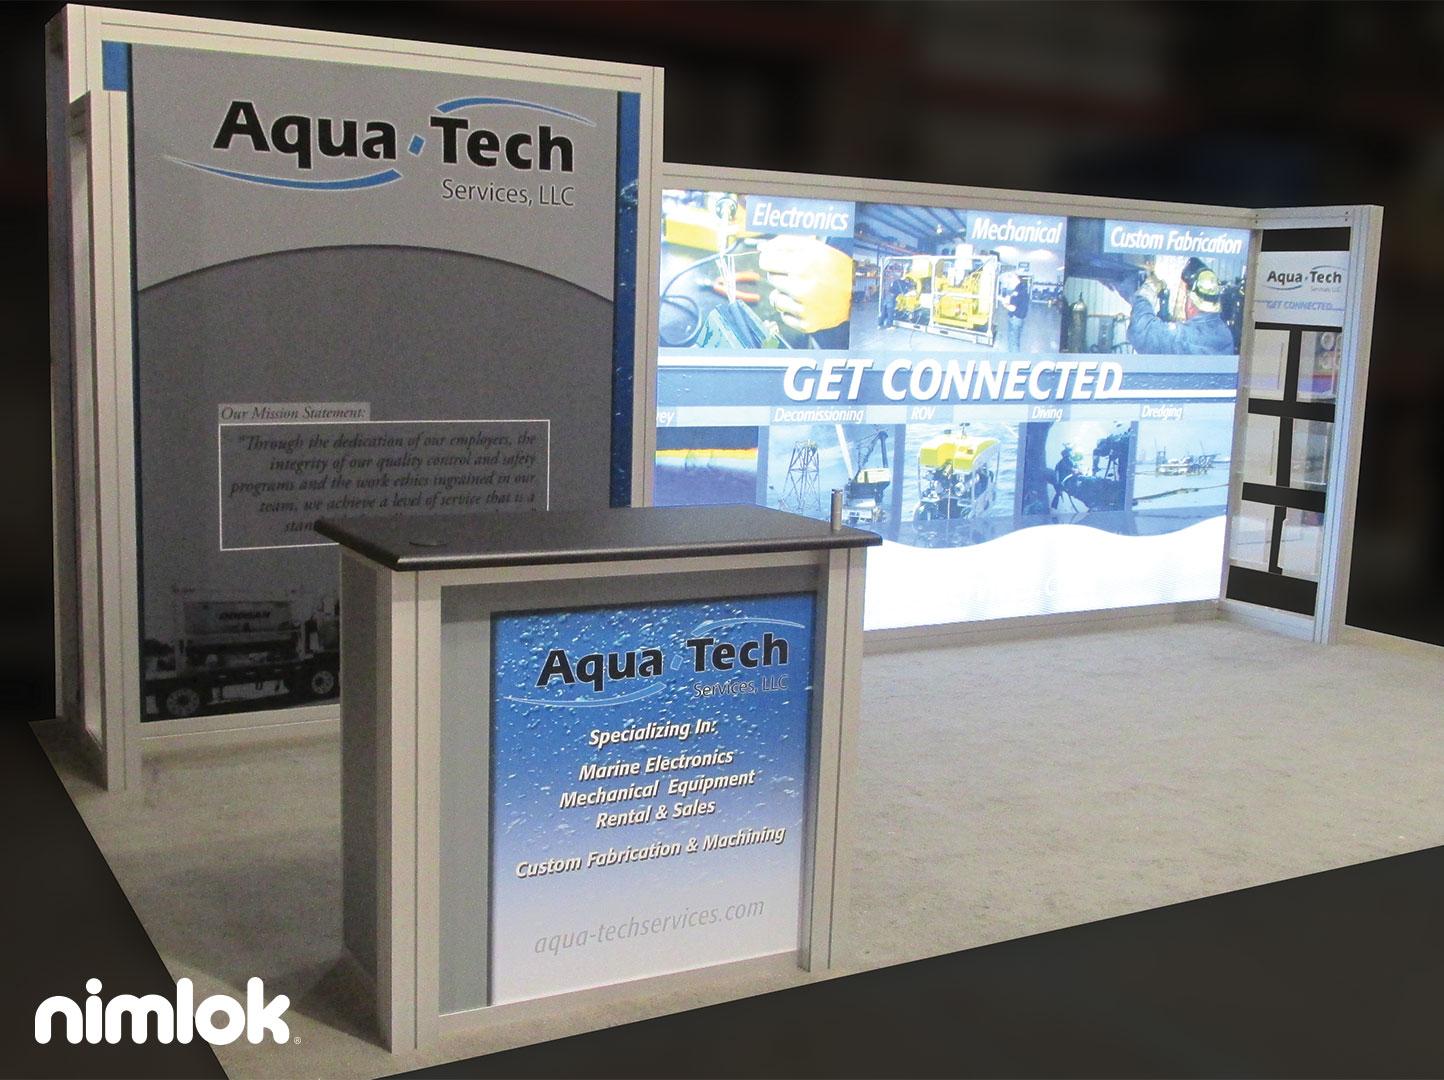 Aquatech Photomain